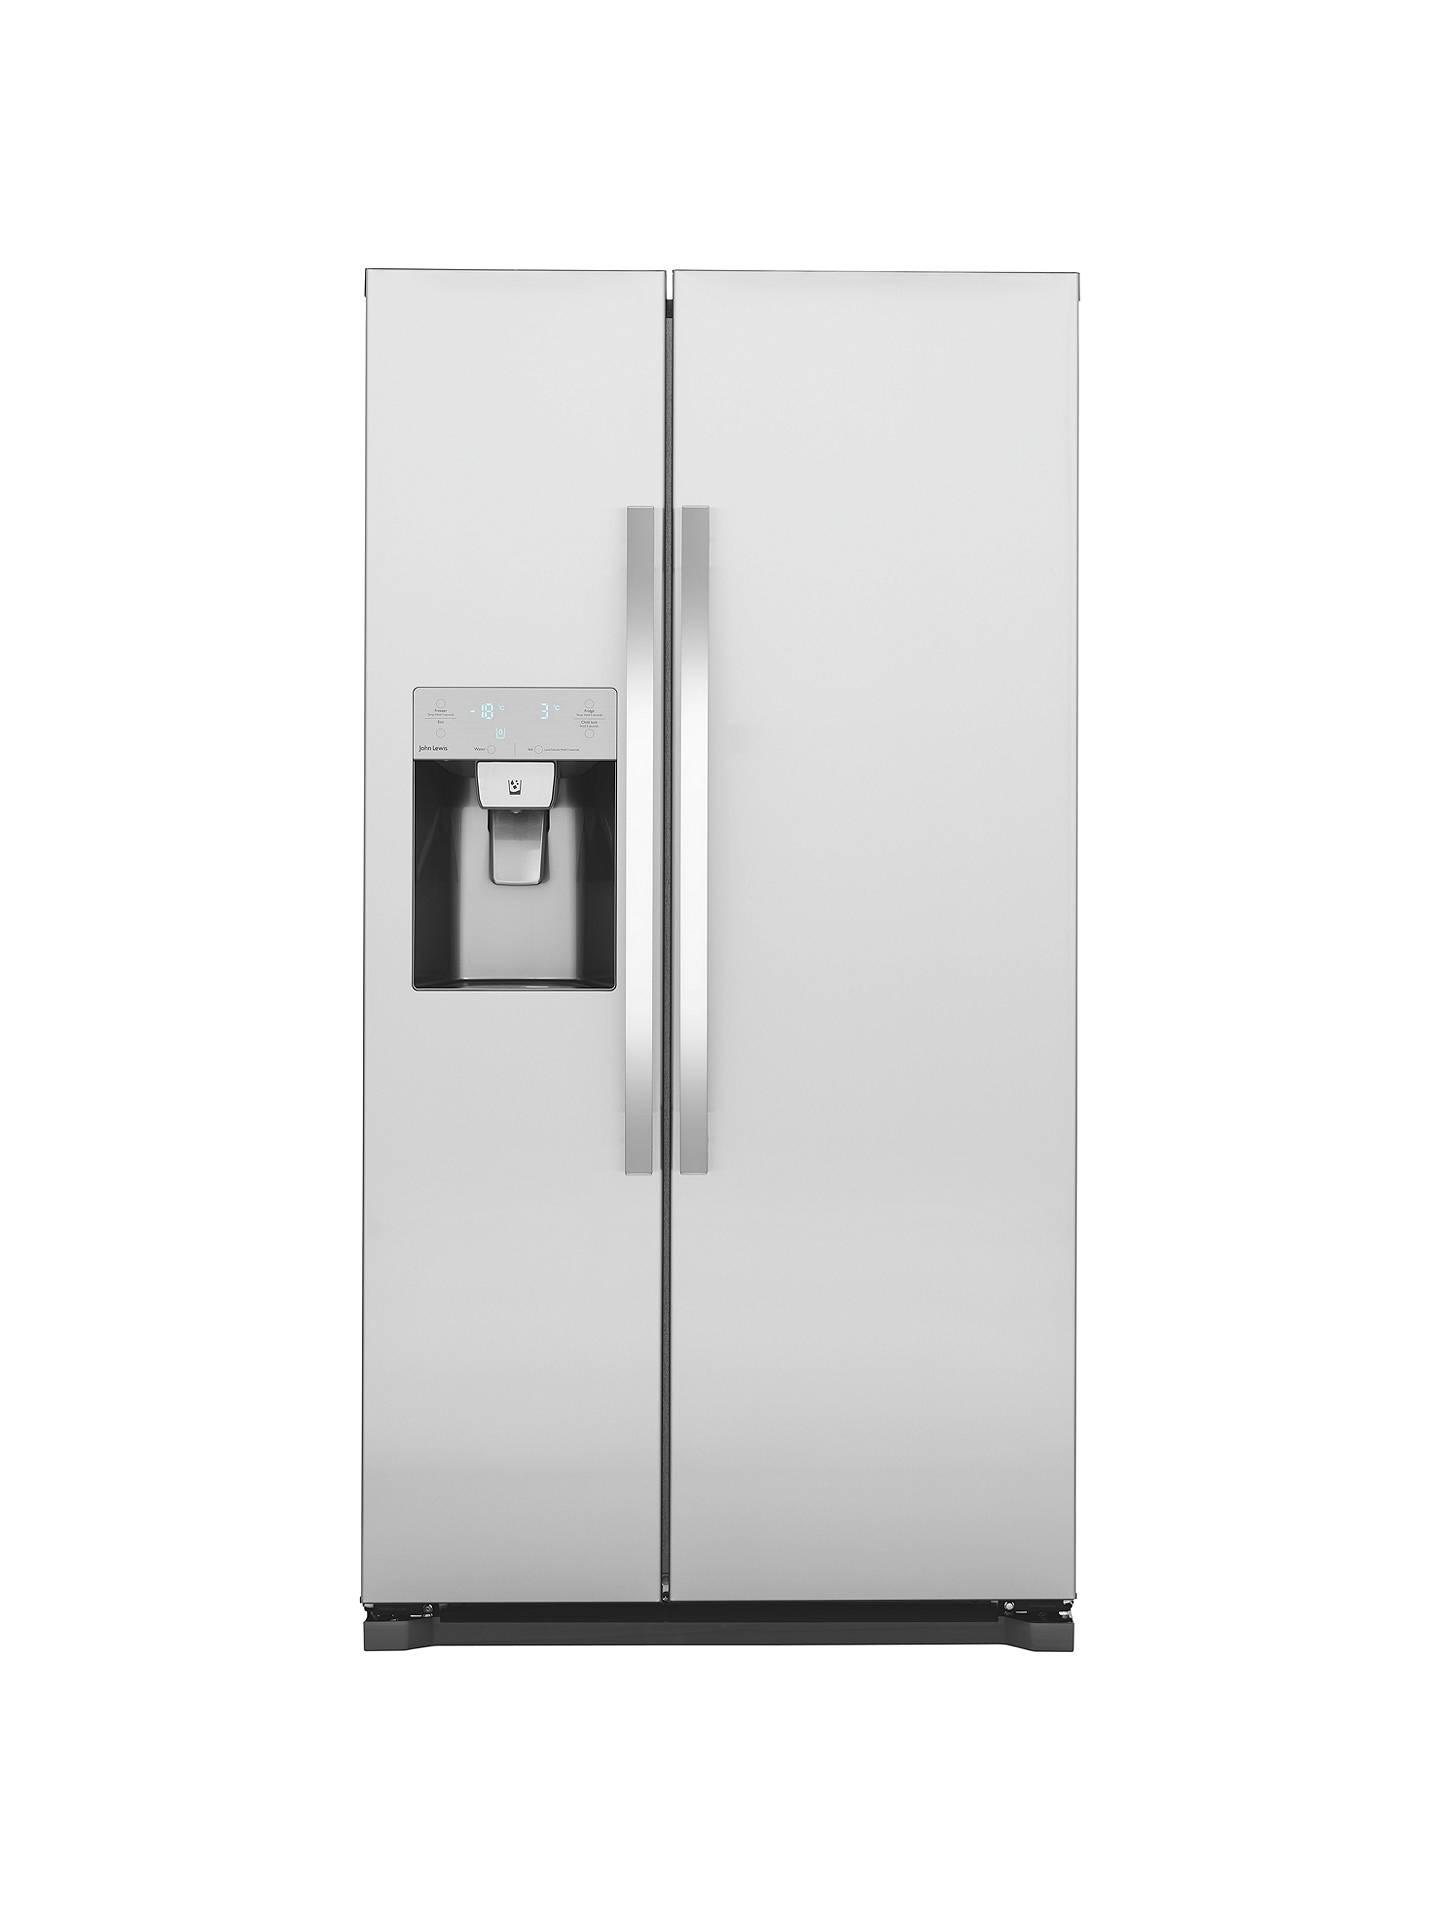 john lewis jlaffss2017 american style fridge freezer a. Black Bedroom Furniture Sets. Home Design Ideas